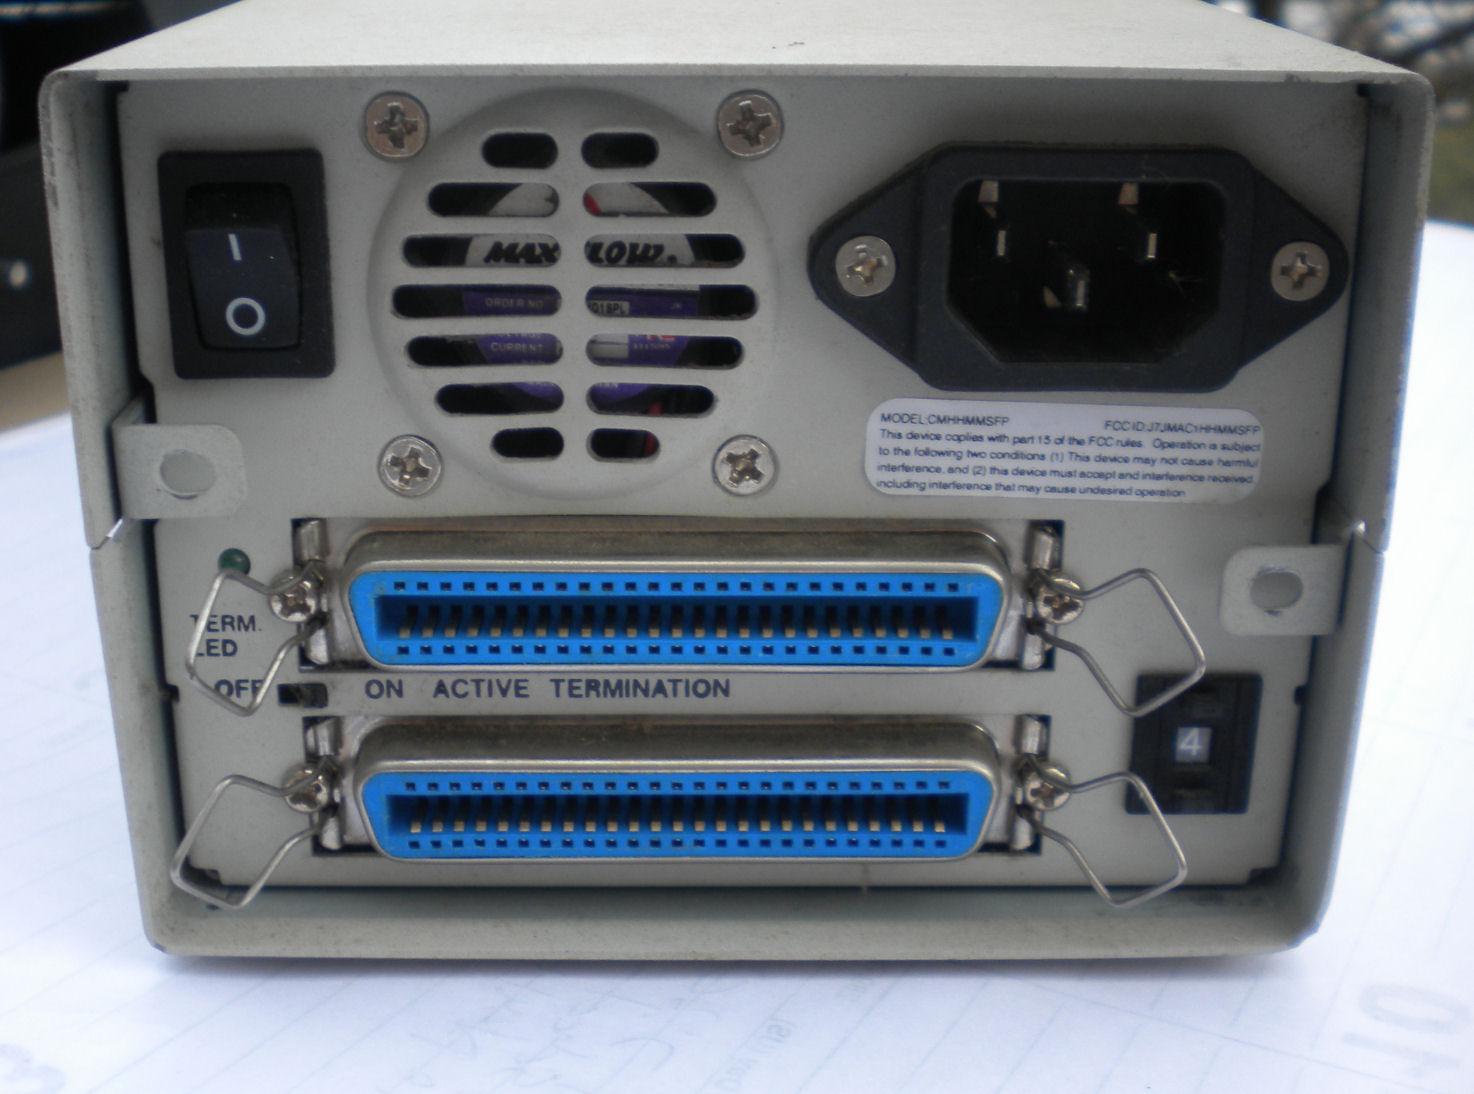 Mac Hard Drives Cd Rom Etc Scsi To Usb Wiring Diagram Club Brand And Back Panel